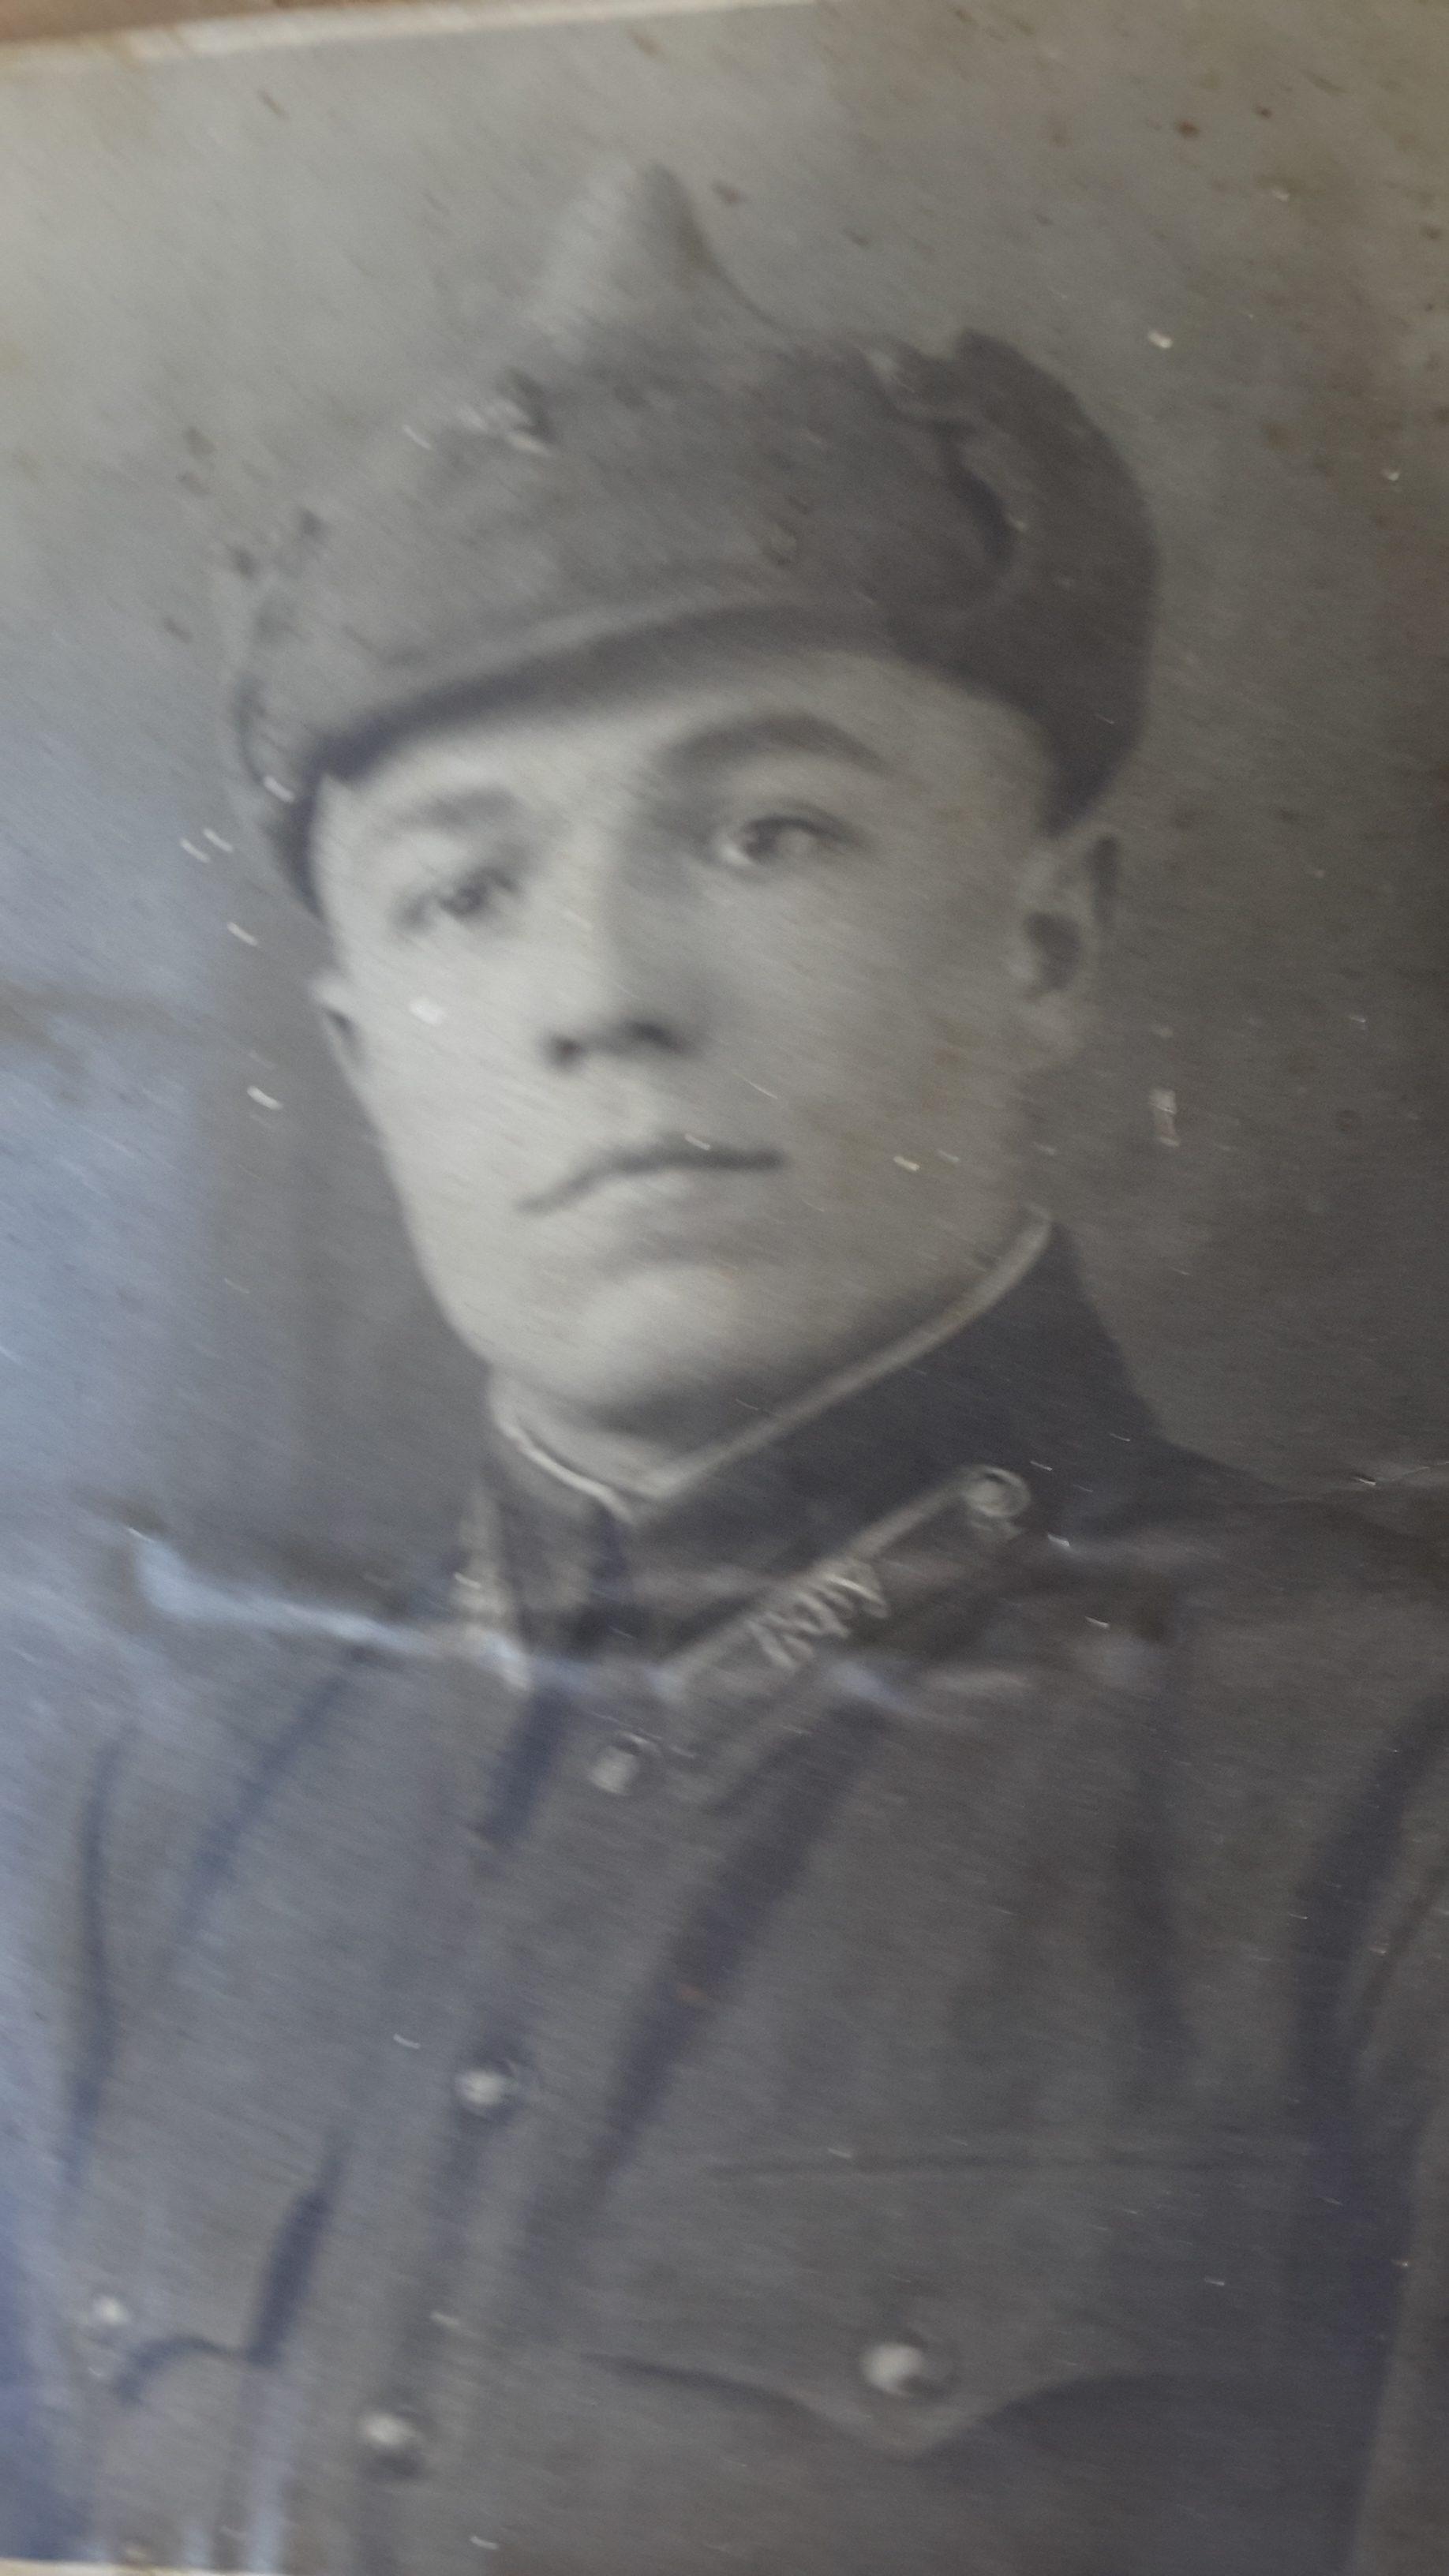 Свиридов Кондратий Павлович - Кемерово, школа №16